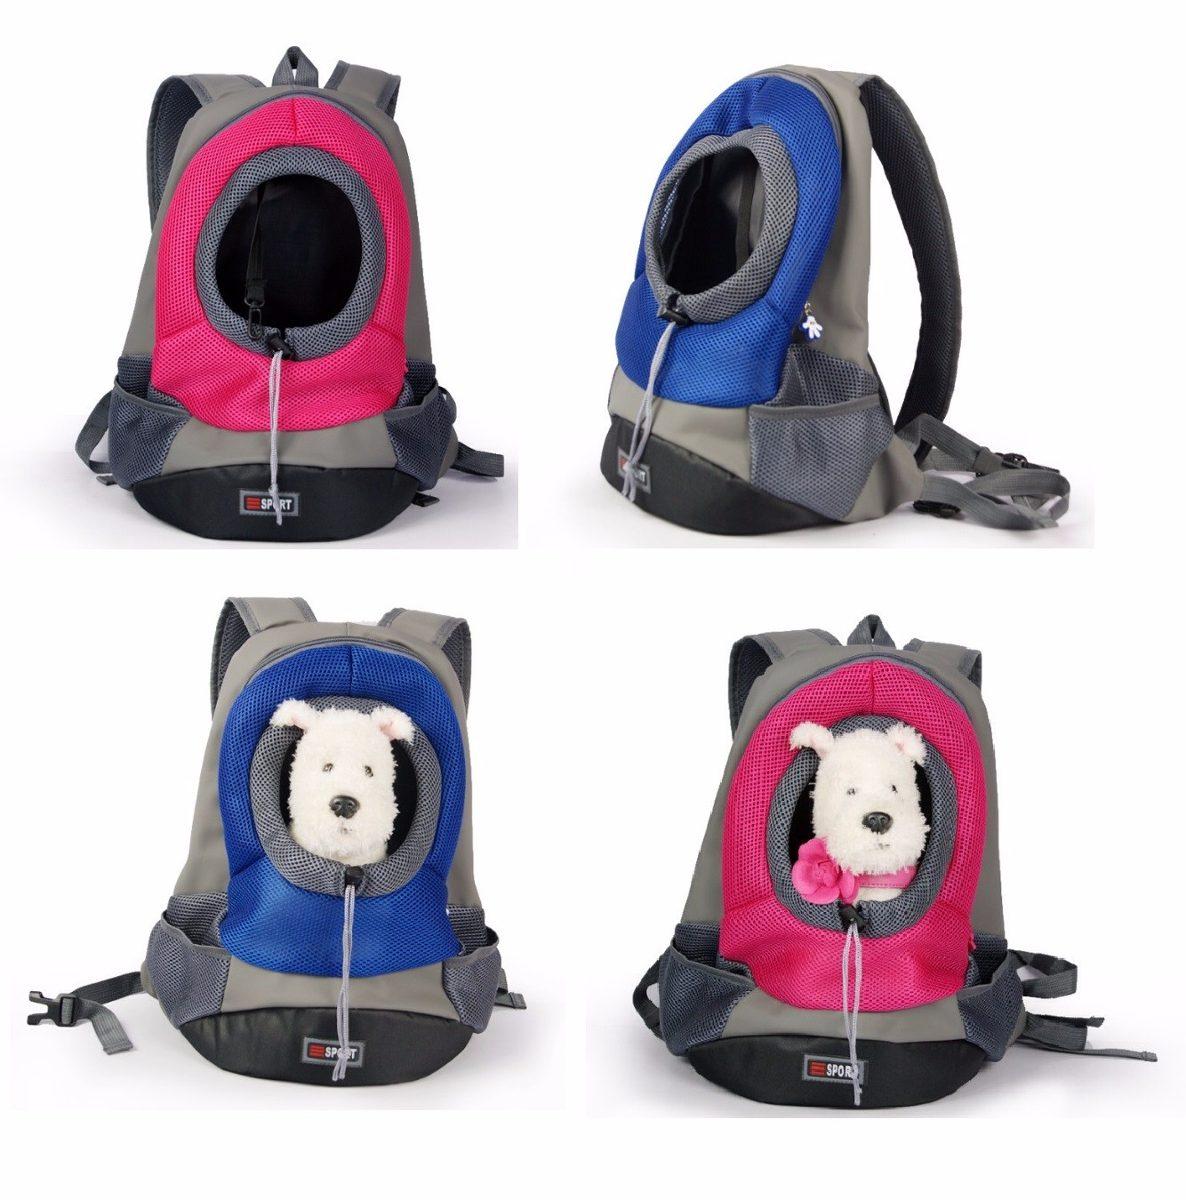 6 Mochila Transportar Zoom Cargando Pequeños Kgs Perros Para Hasta wHXnXx4zq